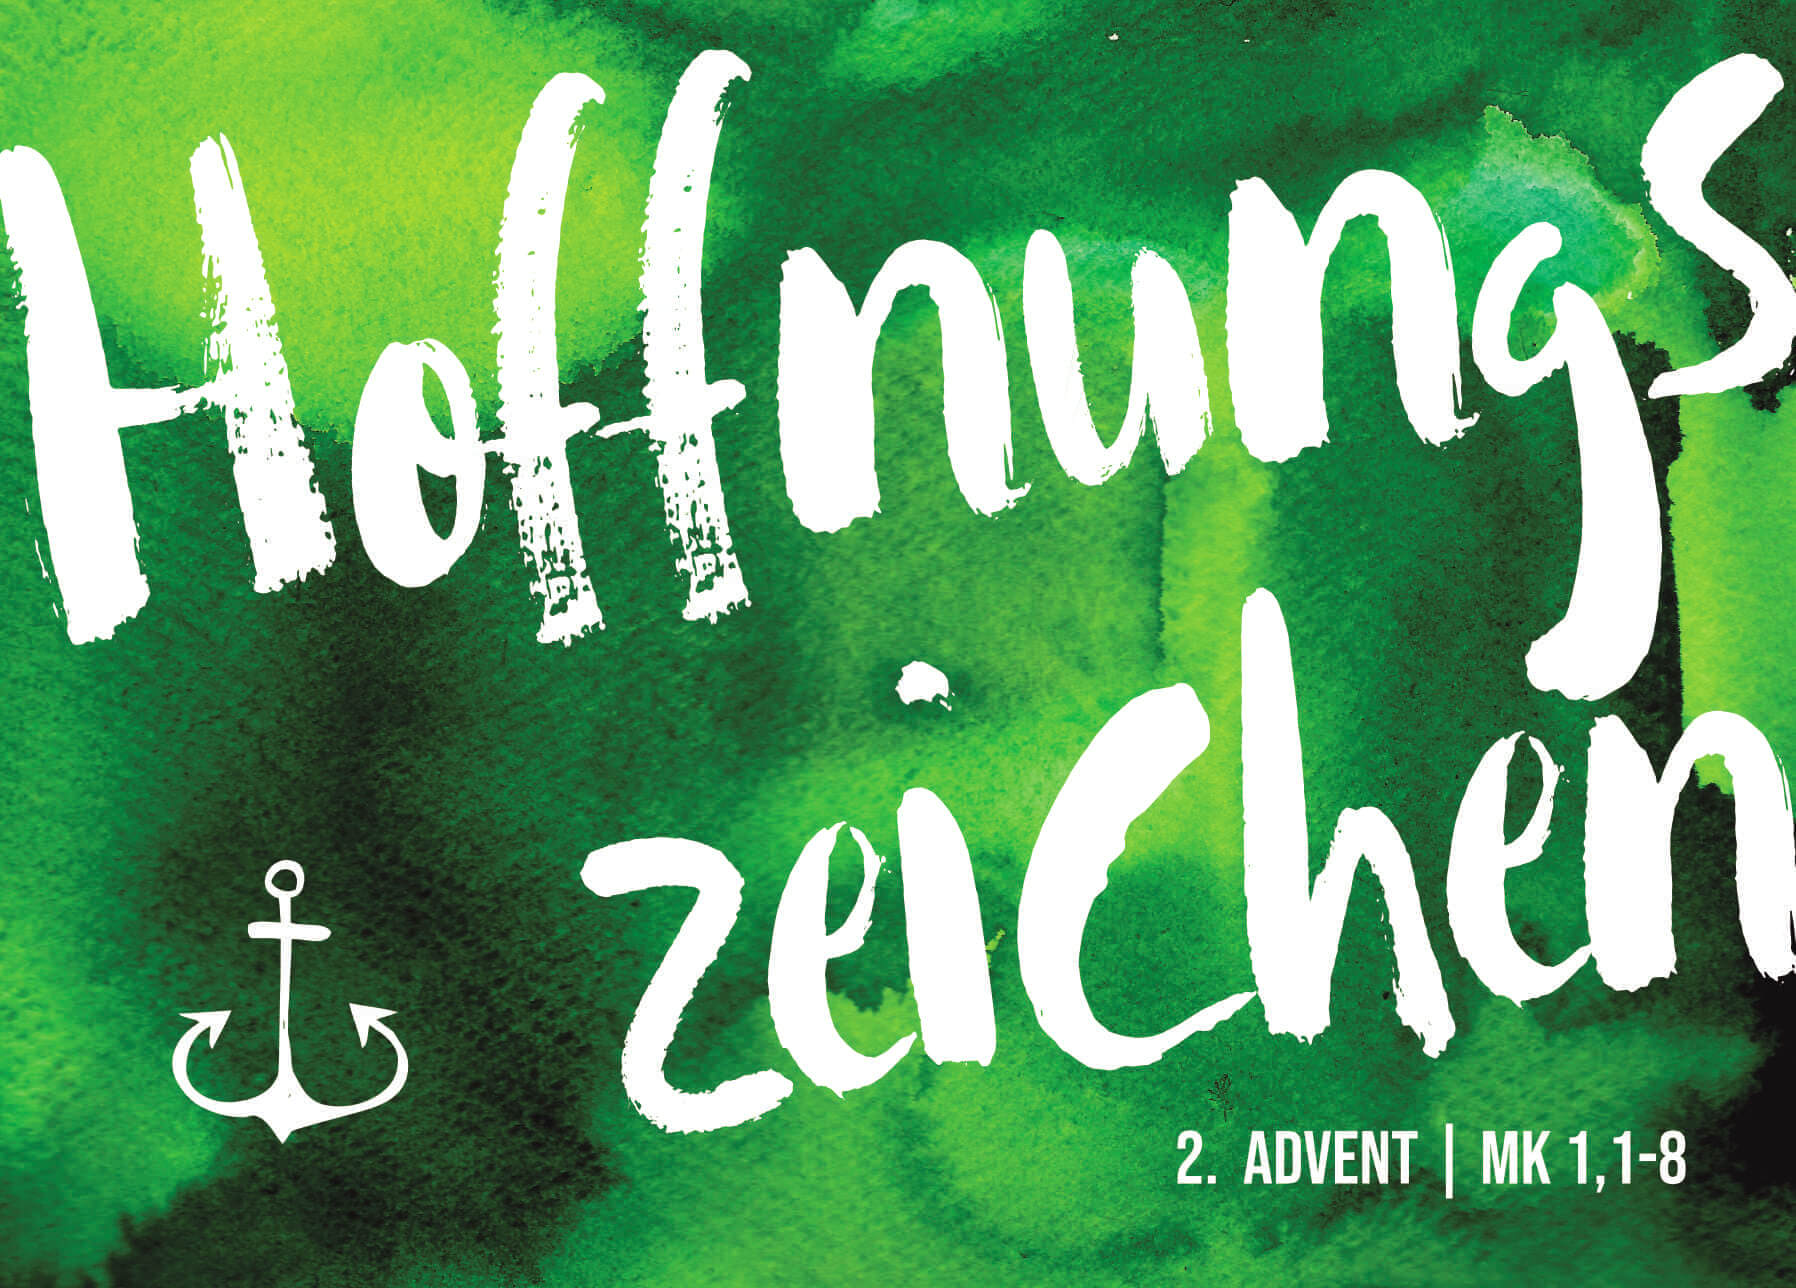 Adventskarte 2. Advent